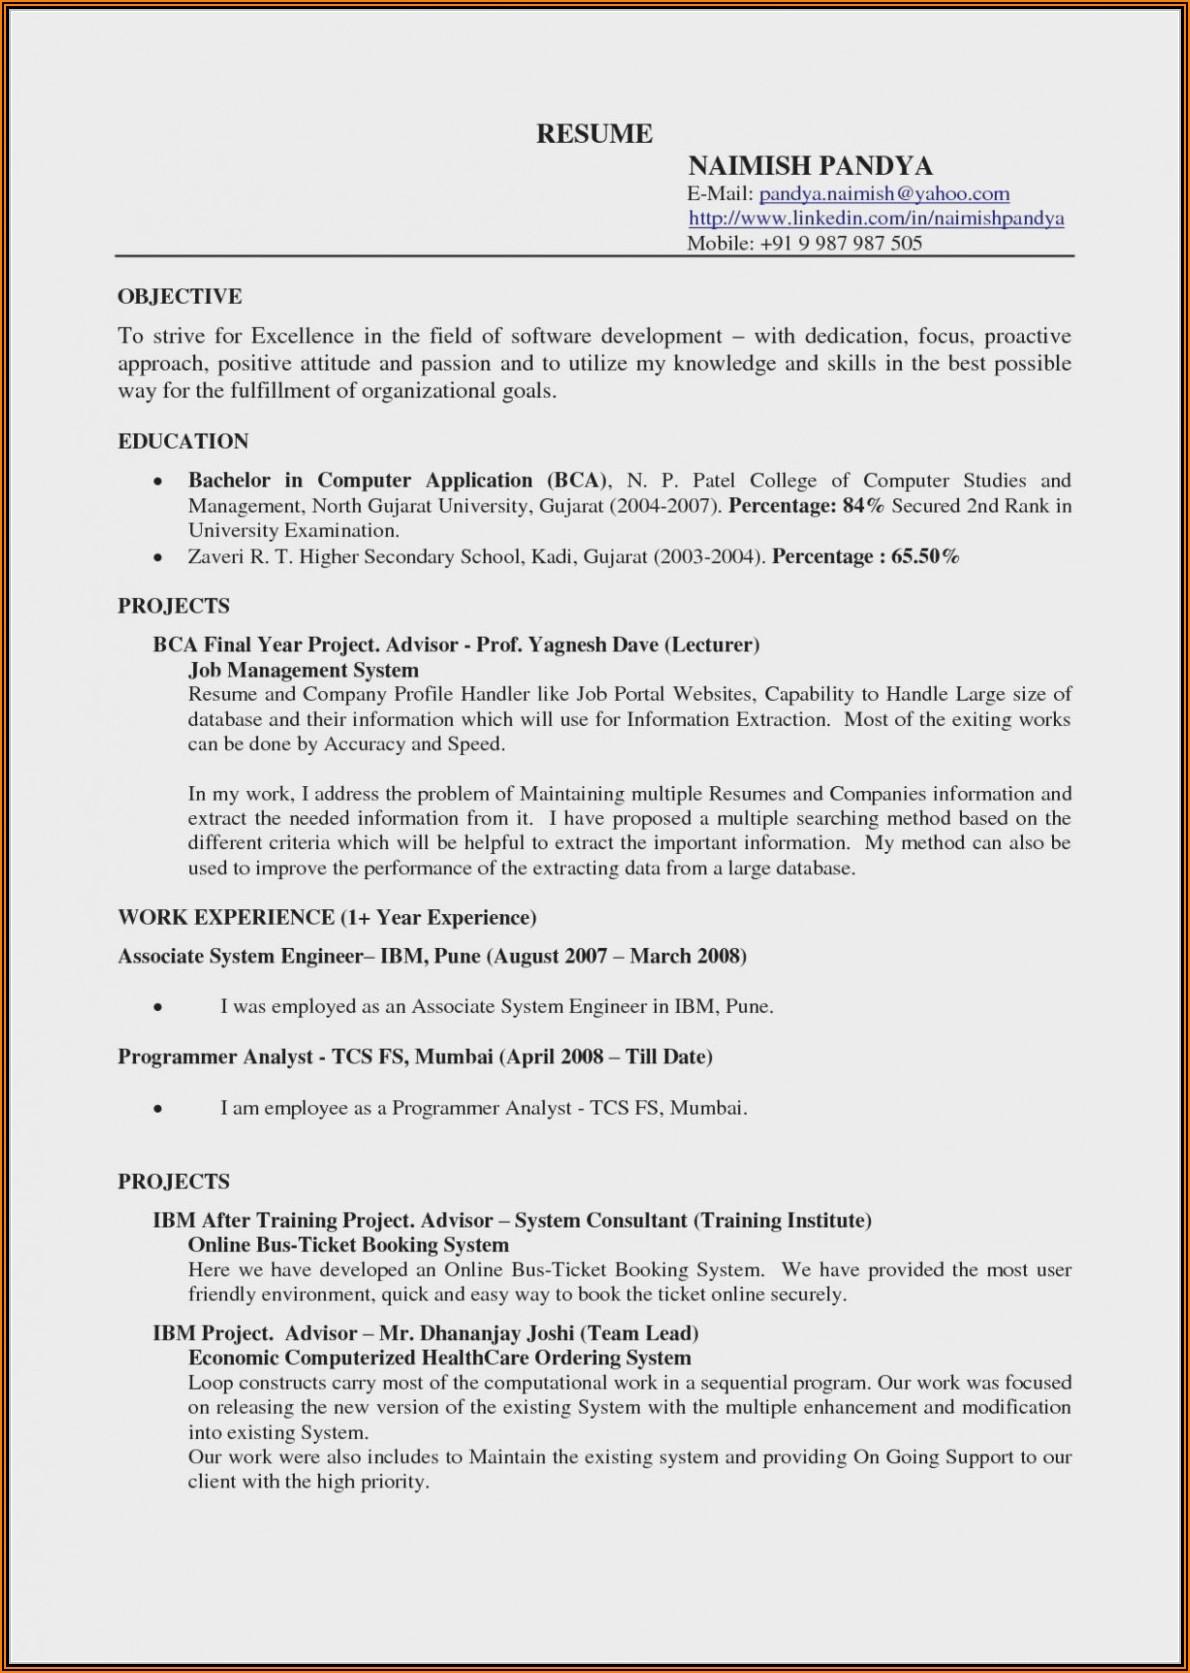 Free Resume Builder Online Reddit